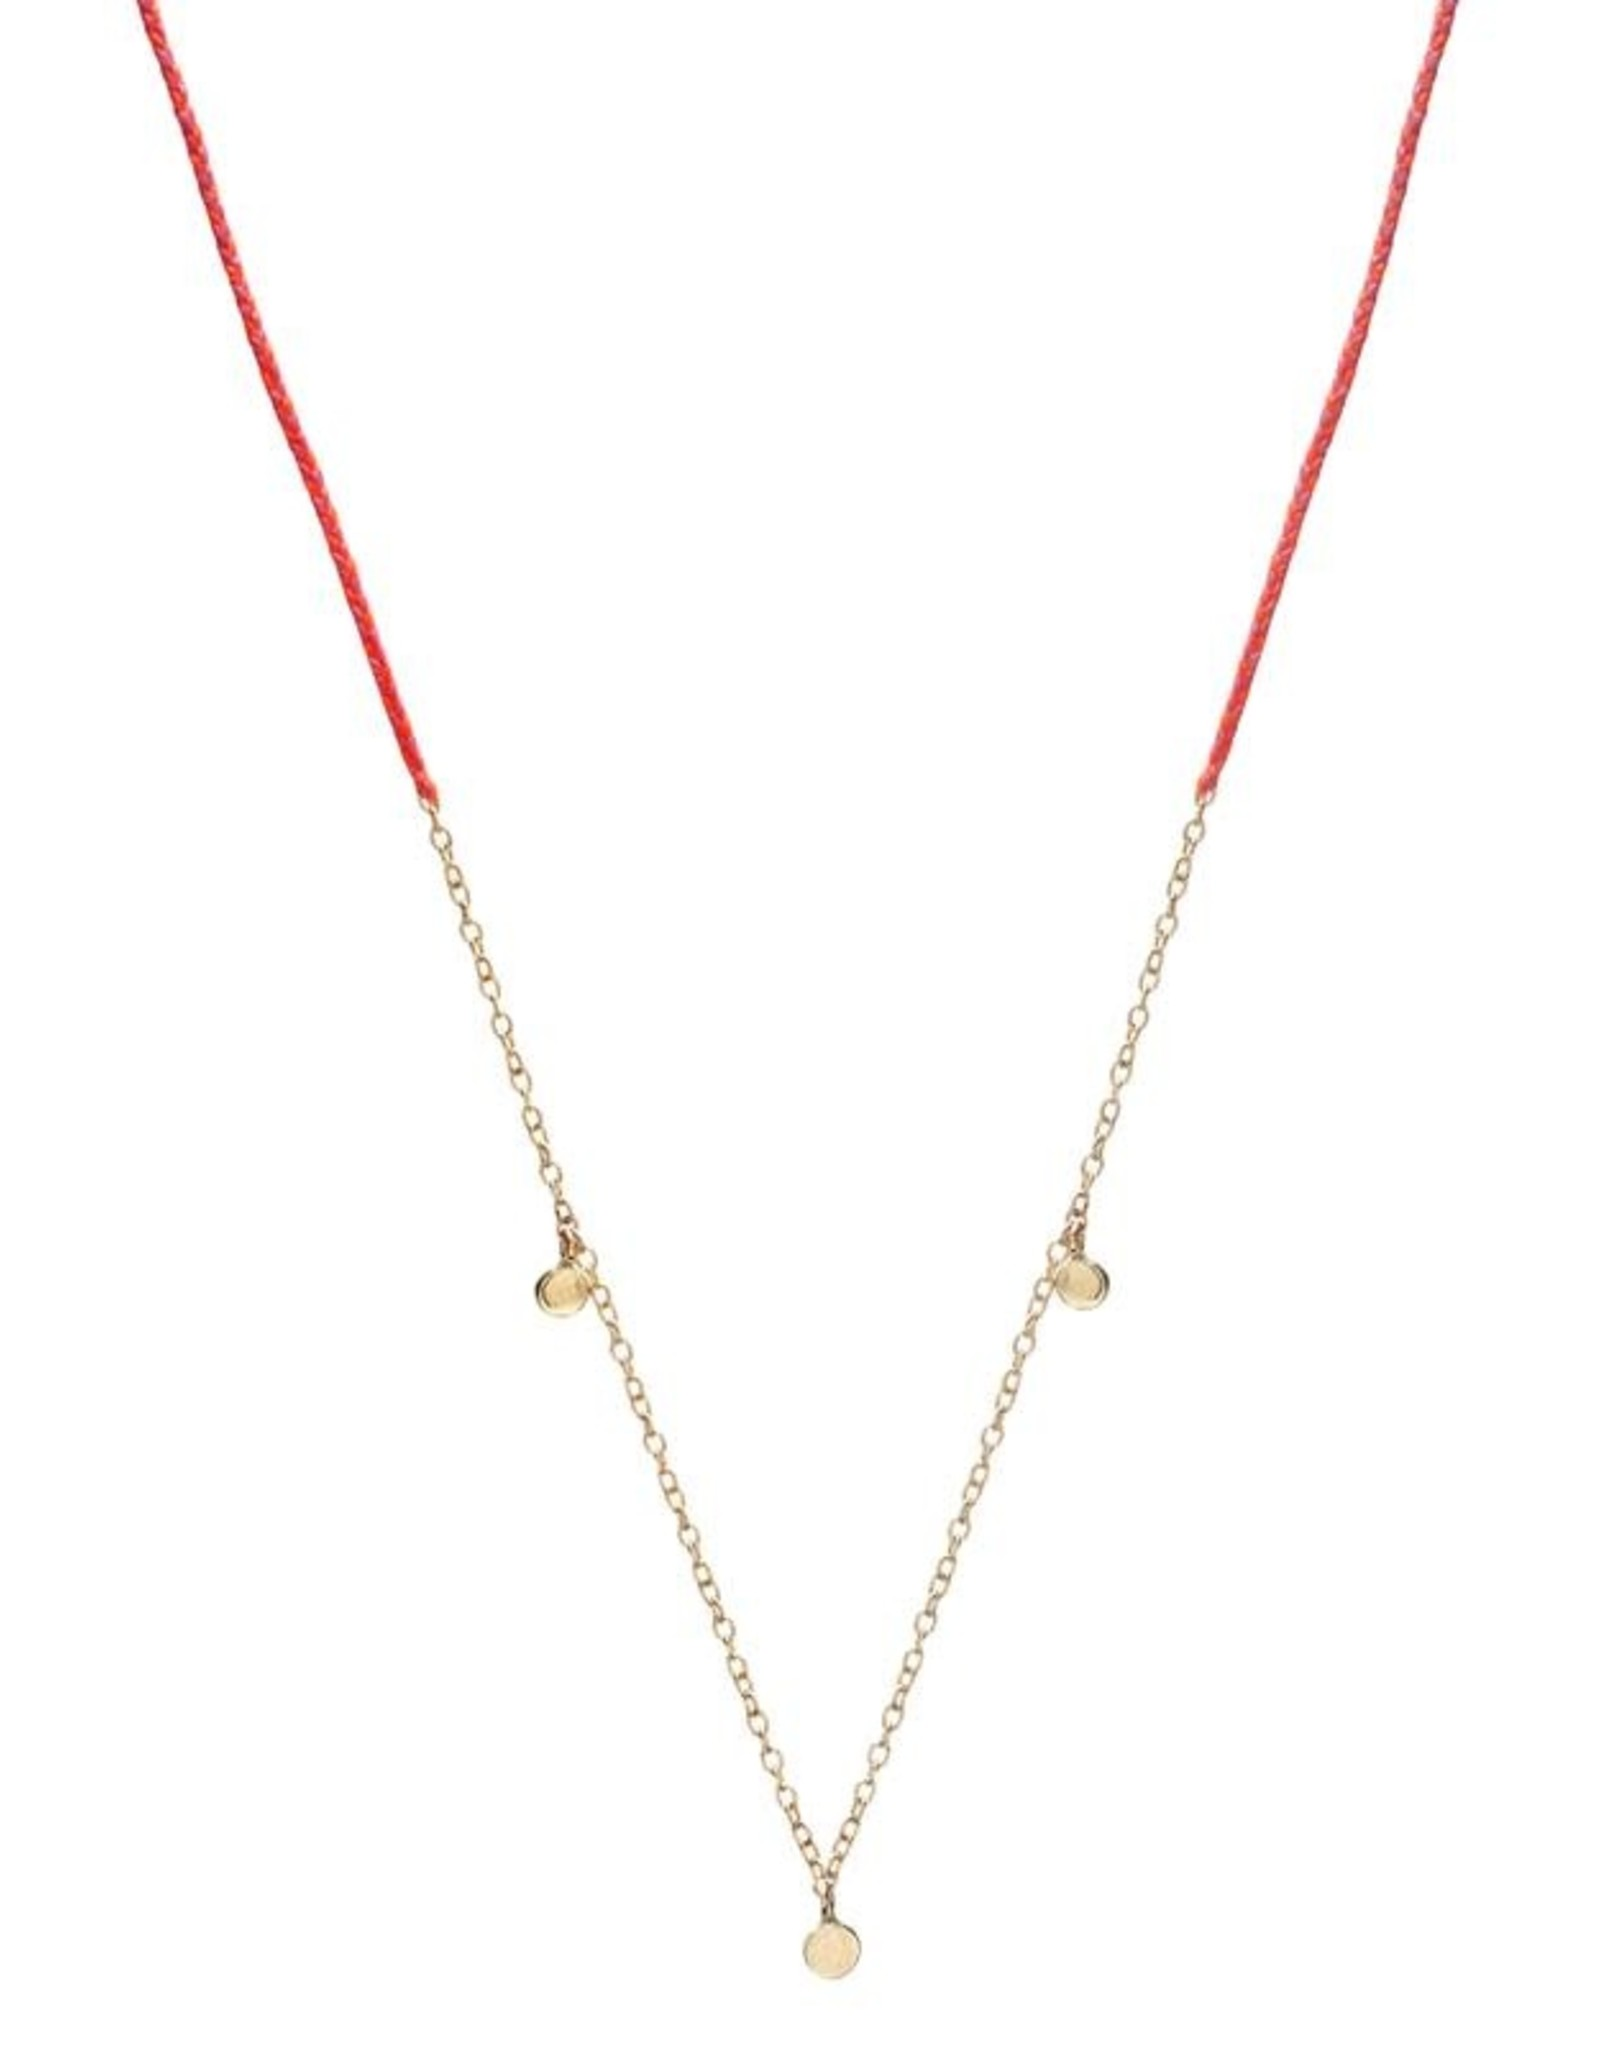 Scosha Precious Fairy Chain Necklace - Hot Pink + Neon Pink